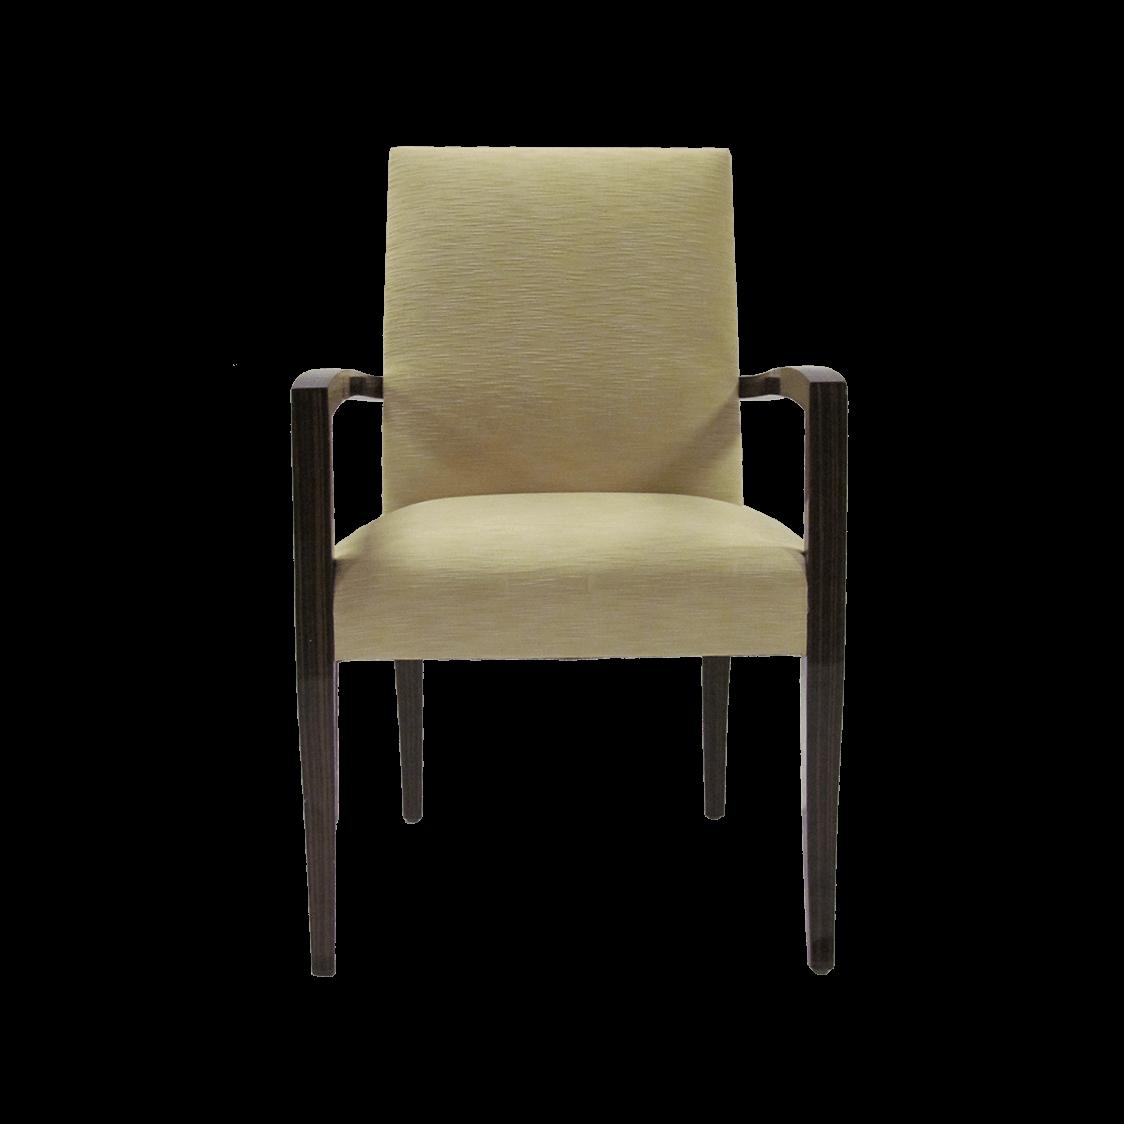 Artisitc_Frame_Arm_Chair